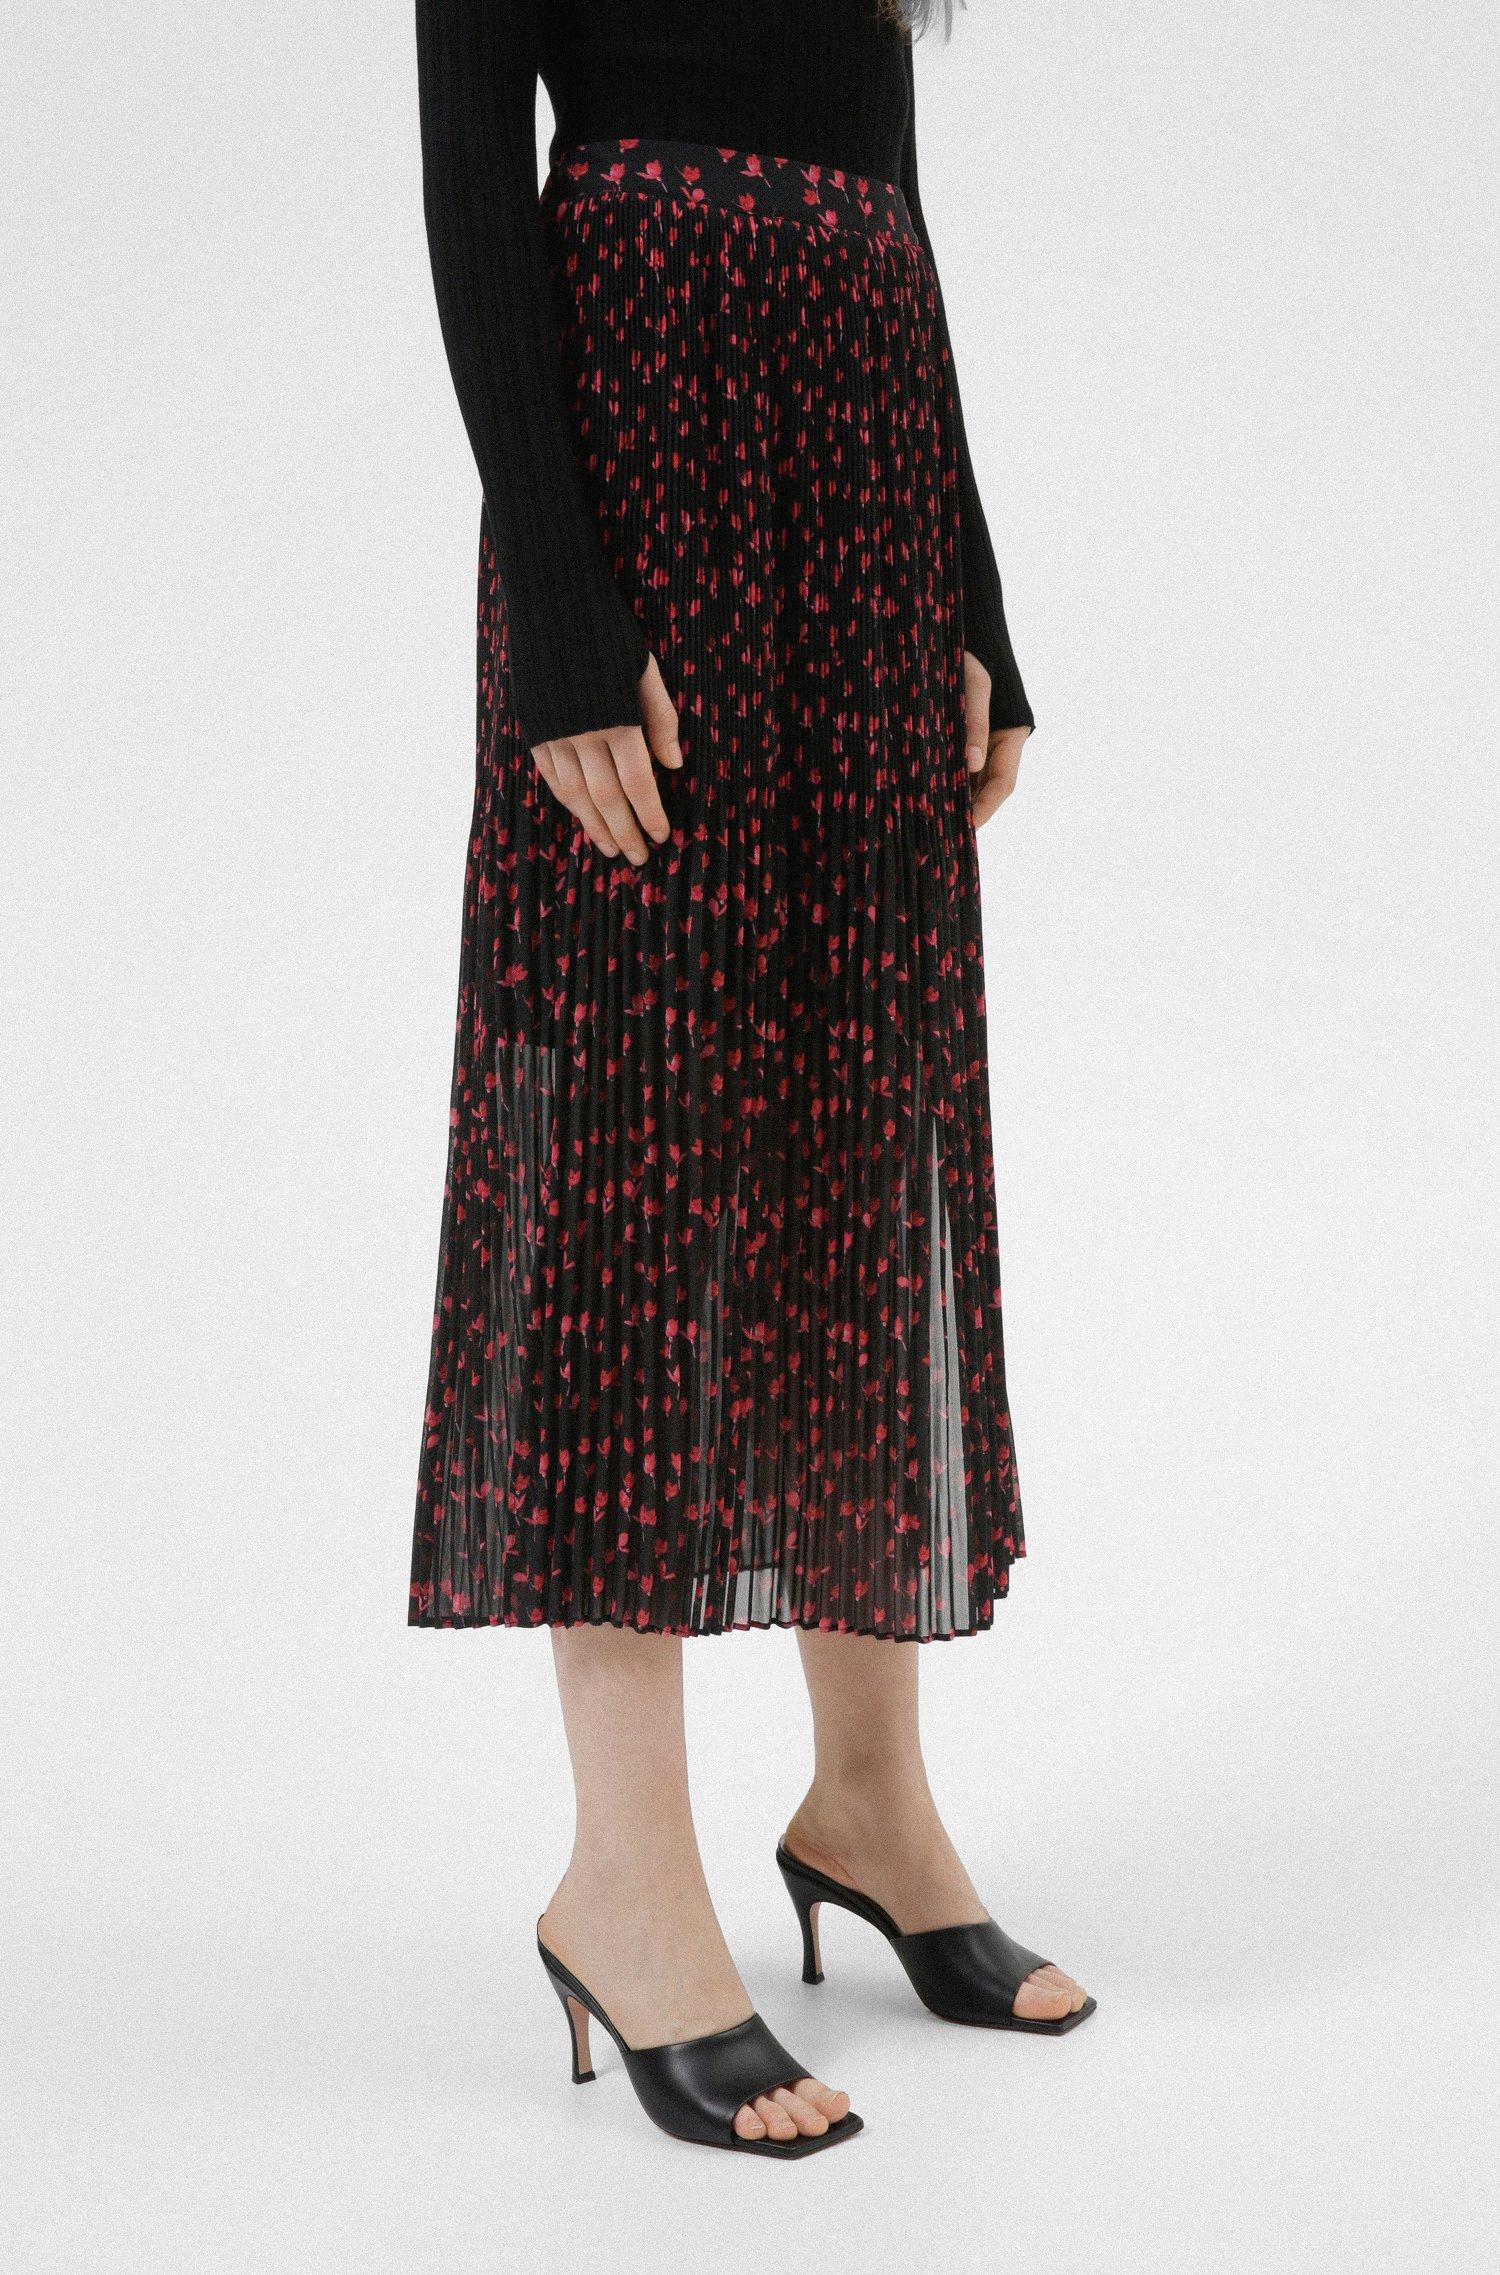 Midi skirt in plissé chiffon with cherry-blossom print, Patterned